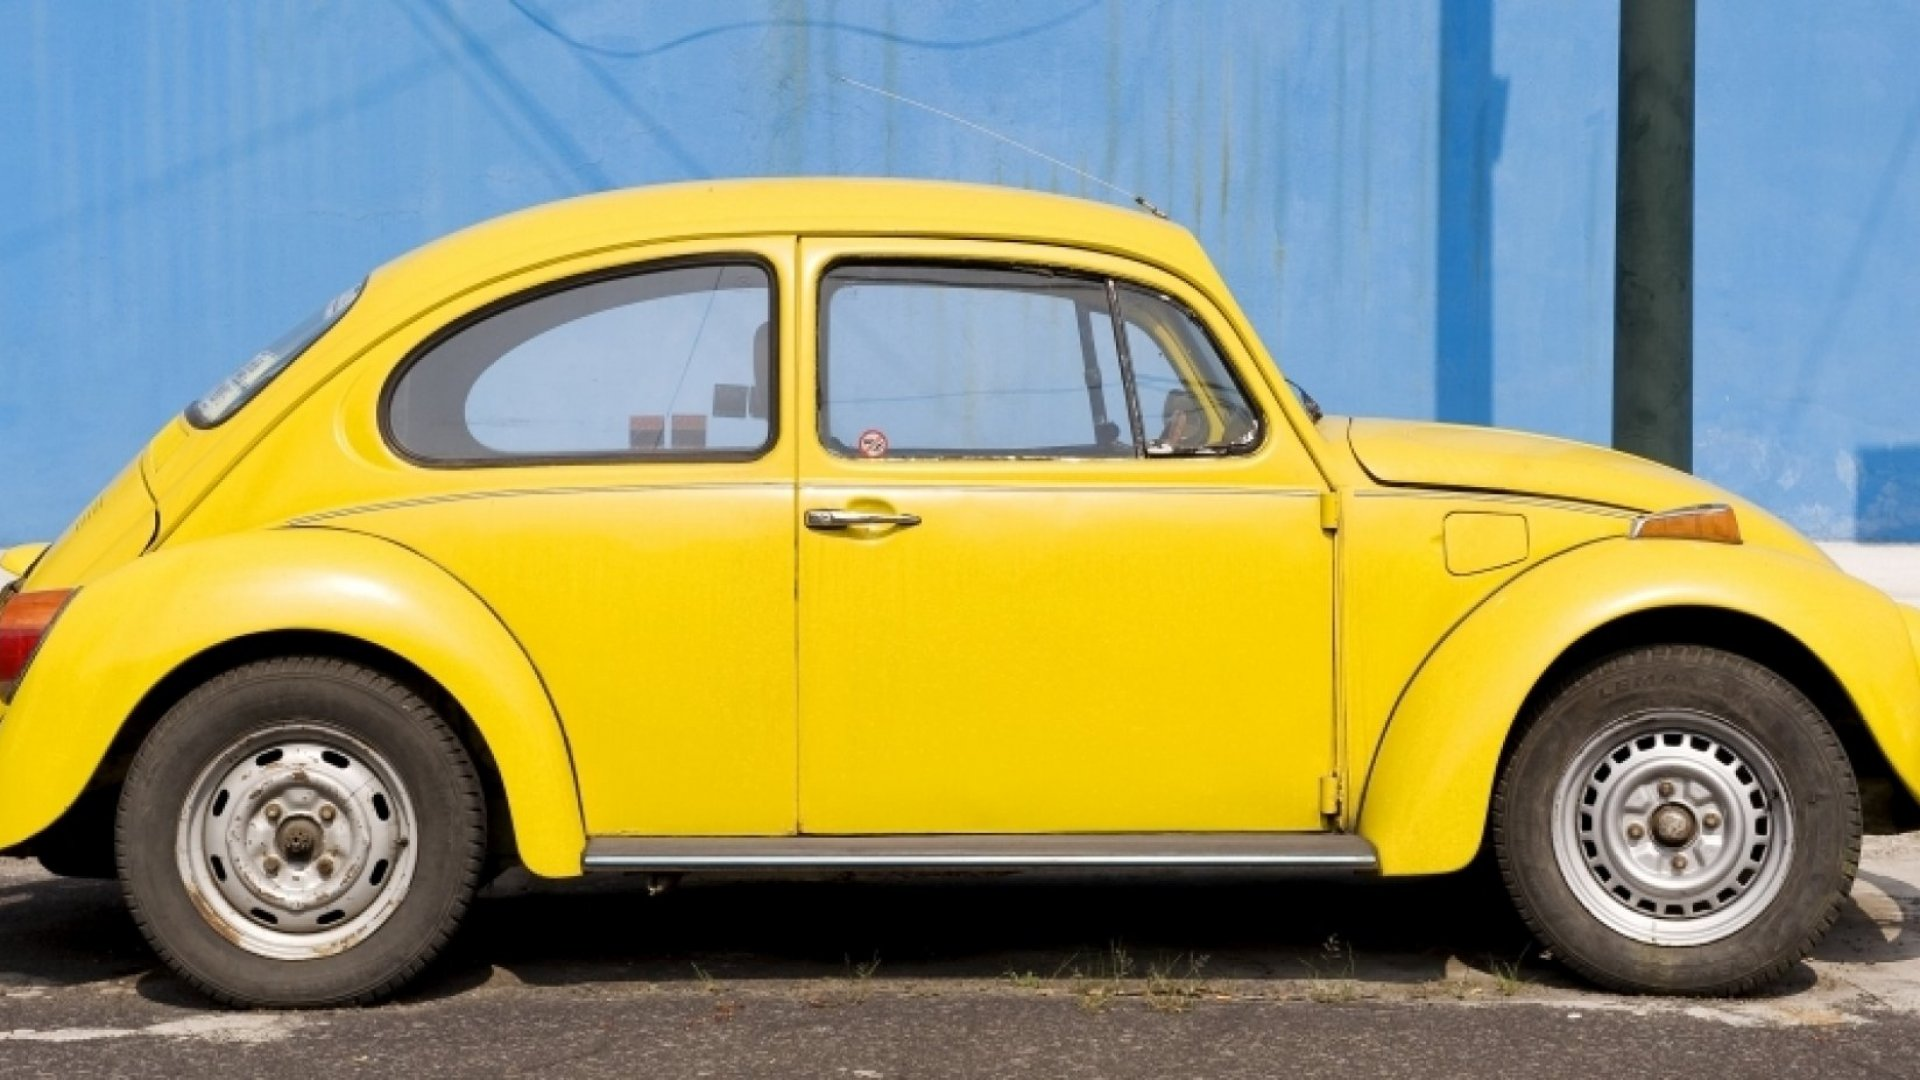 How to Use The Yellow Car Phenomenon